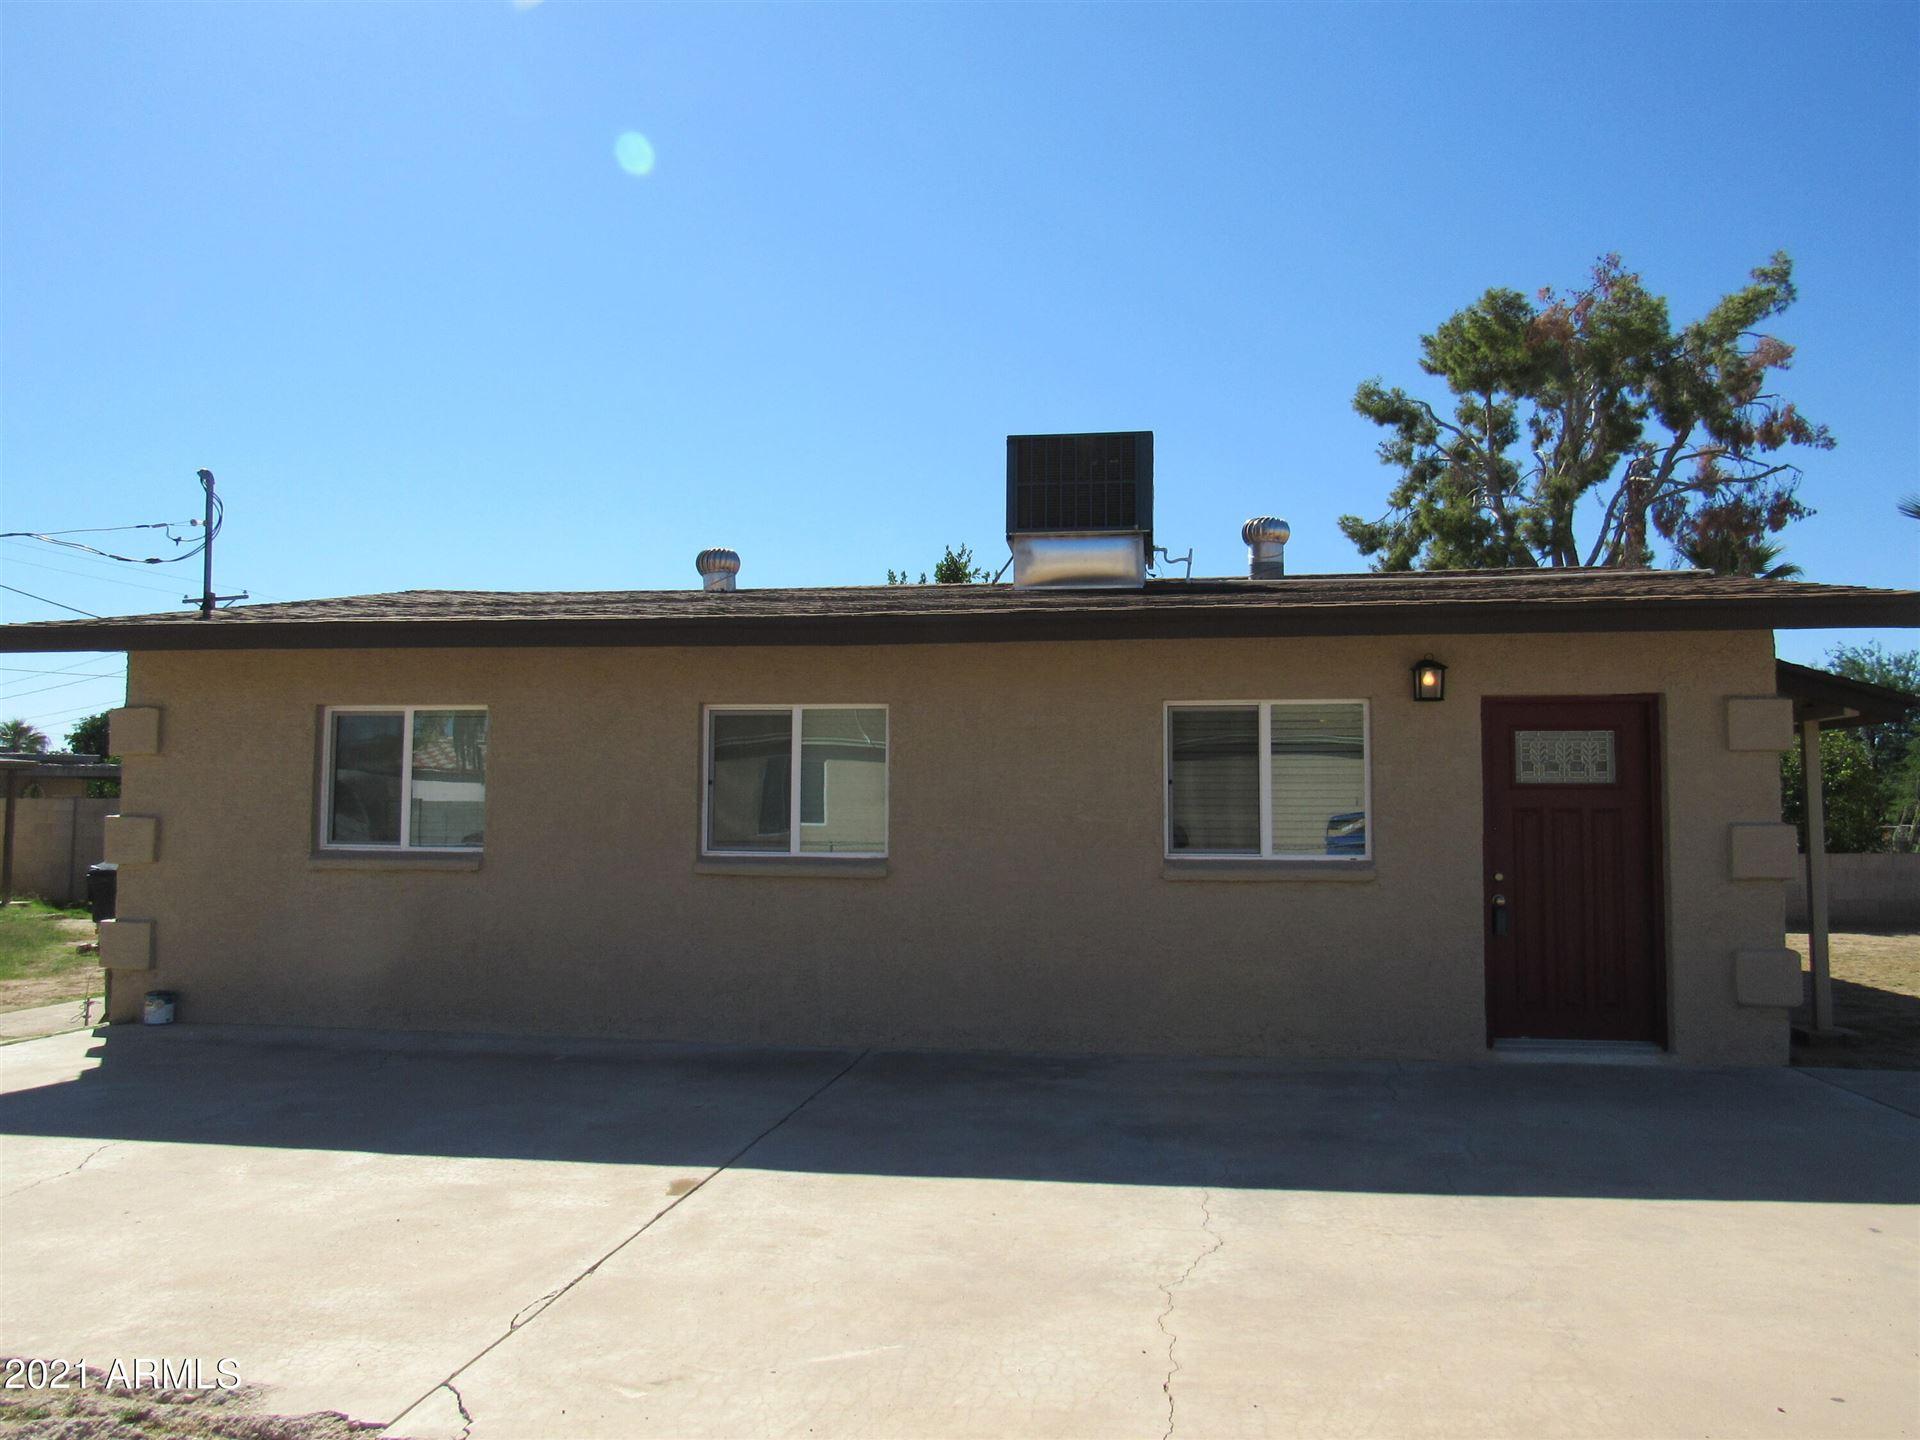 Photo of 1251 S 111TH Drive, Avondale, AZ 85323 (MLS # 6305571)